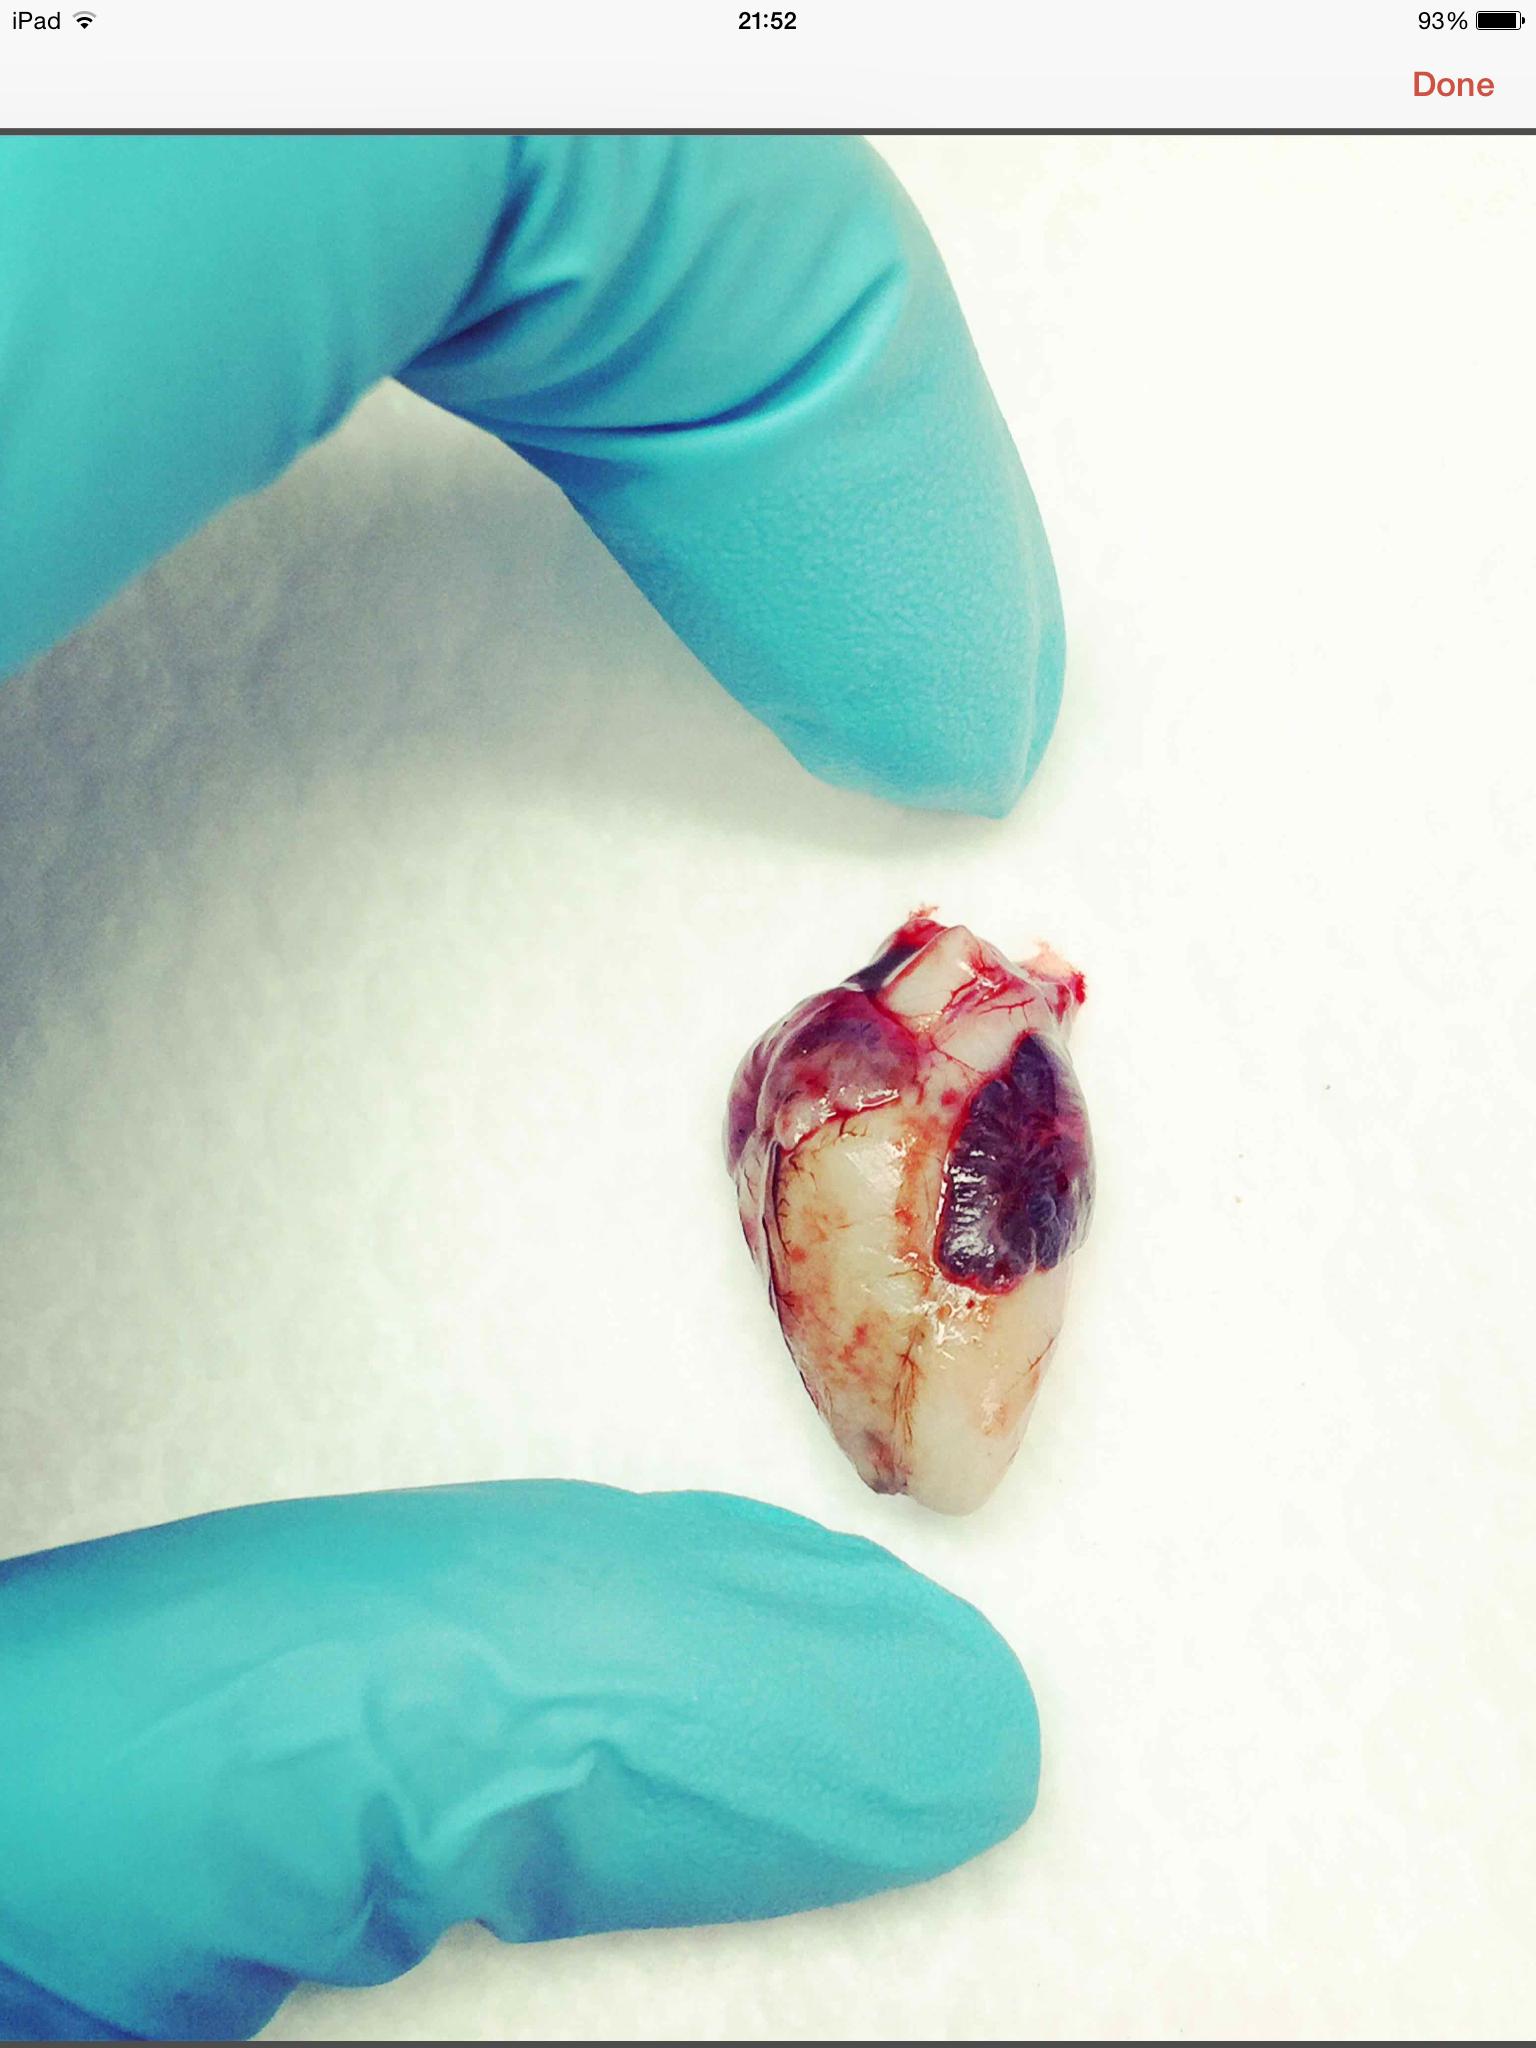 20wk old fetal heart   Heart   Pinterest   20 semanas, Medicina y ...